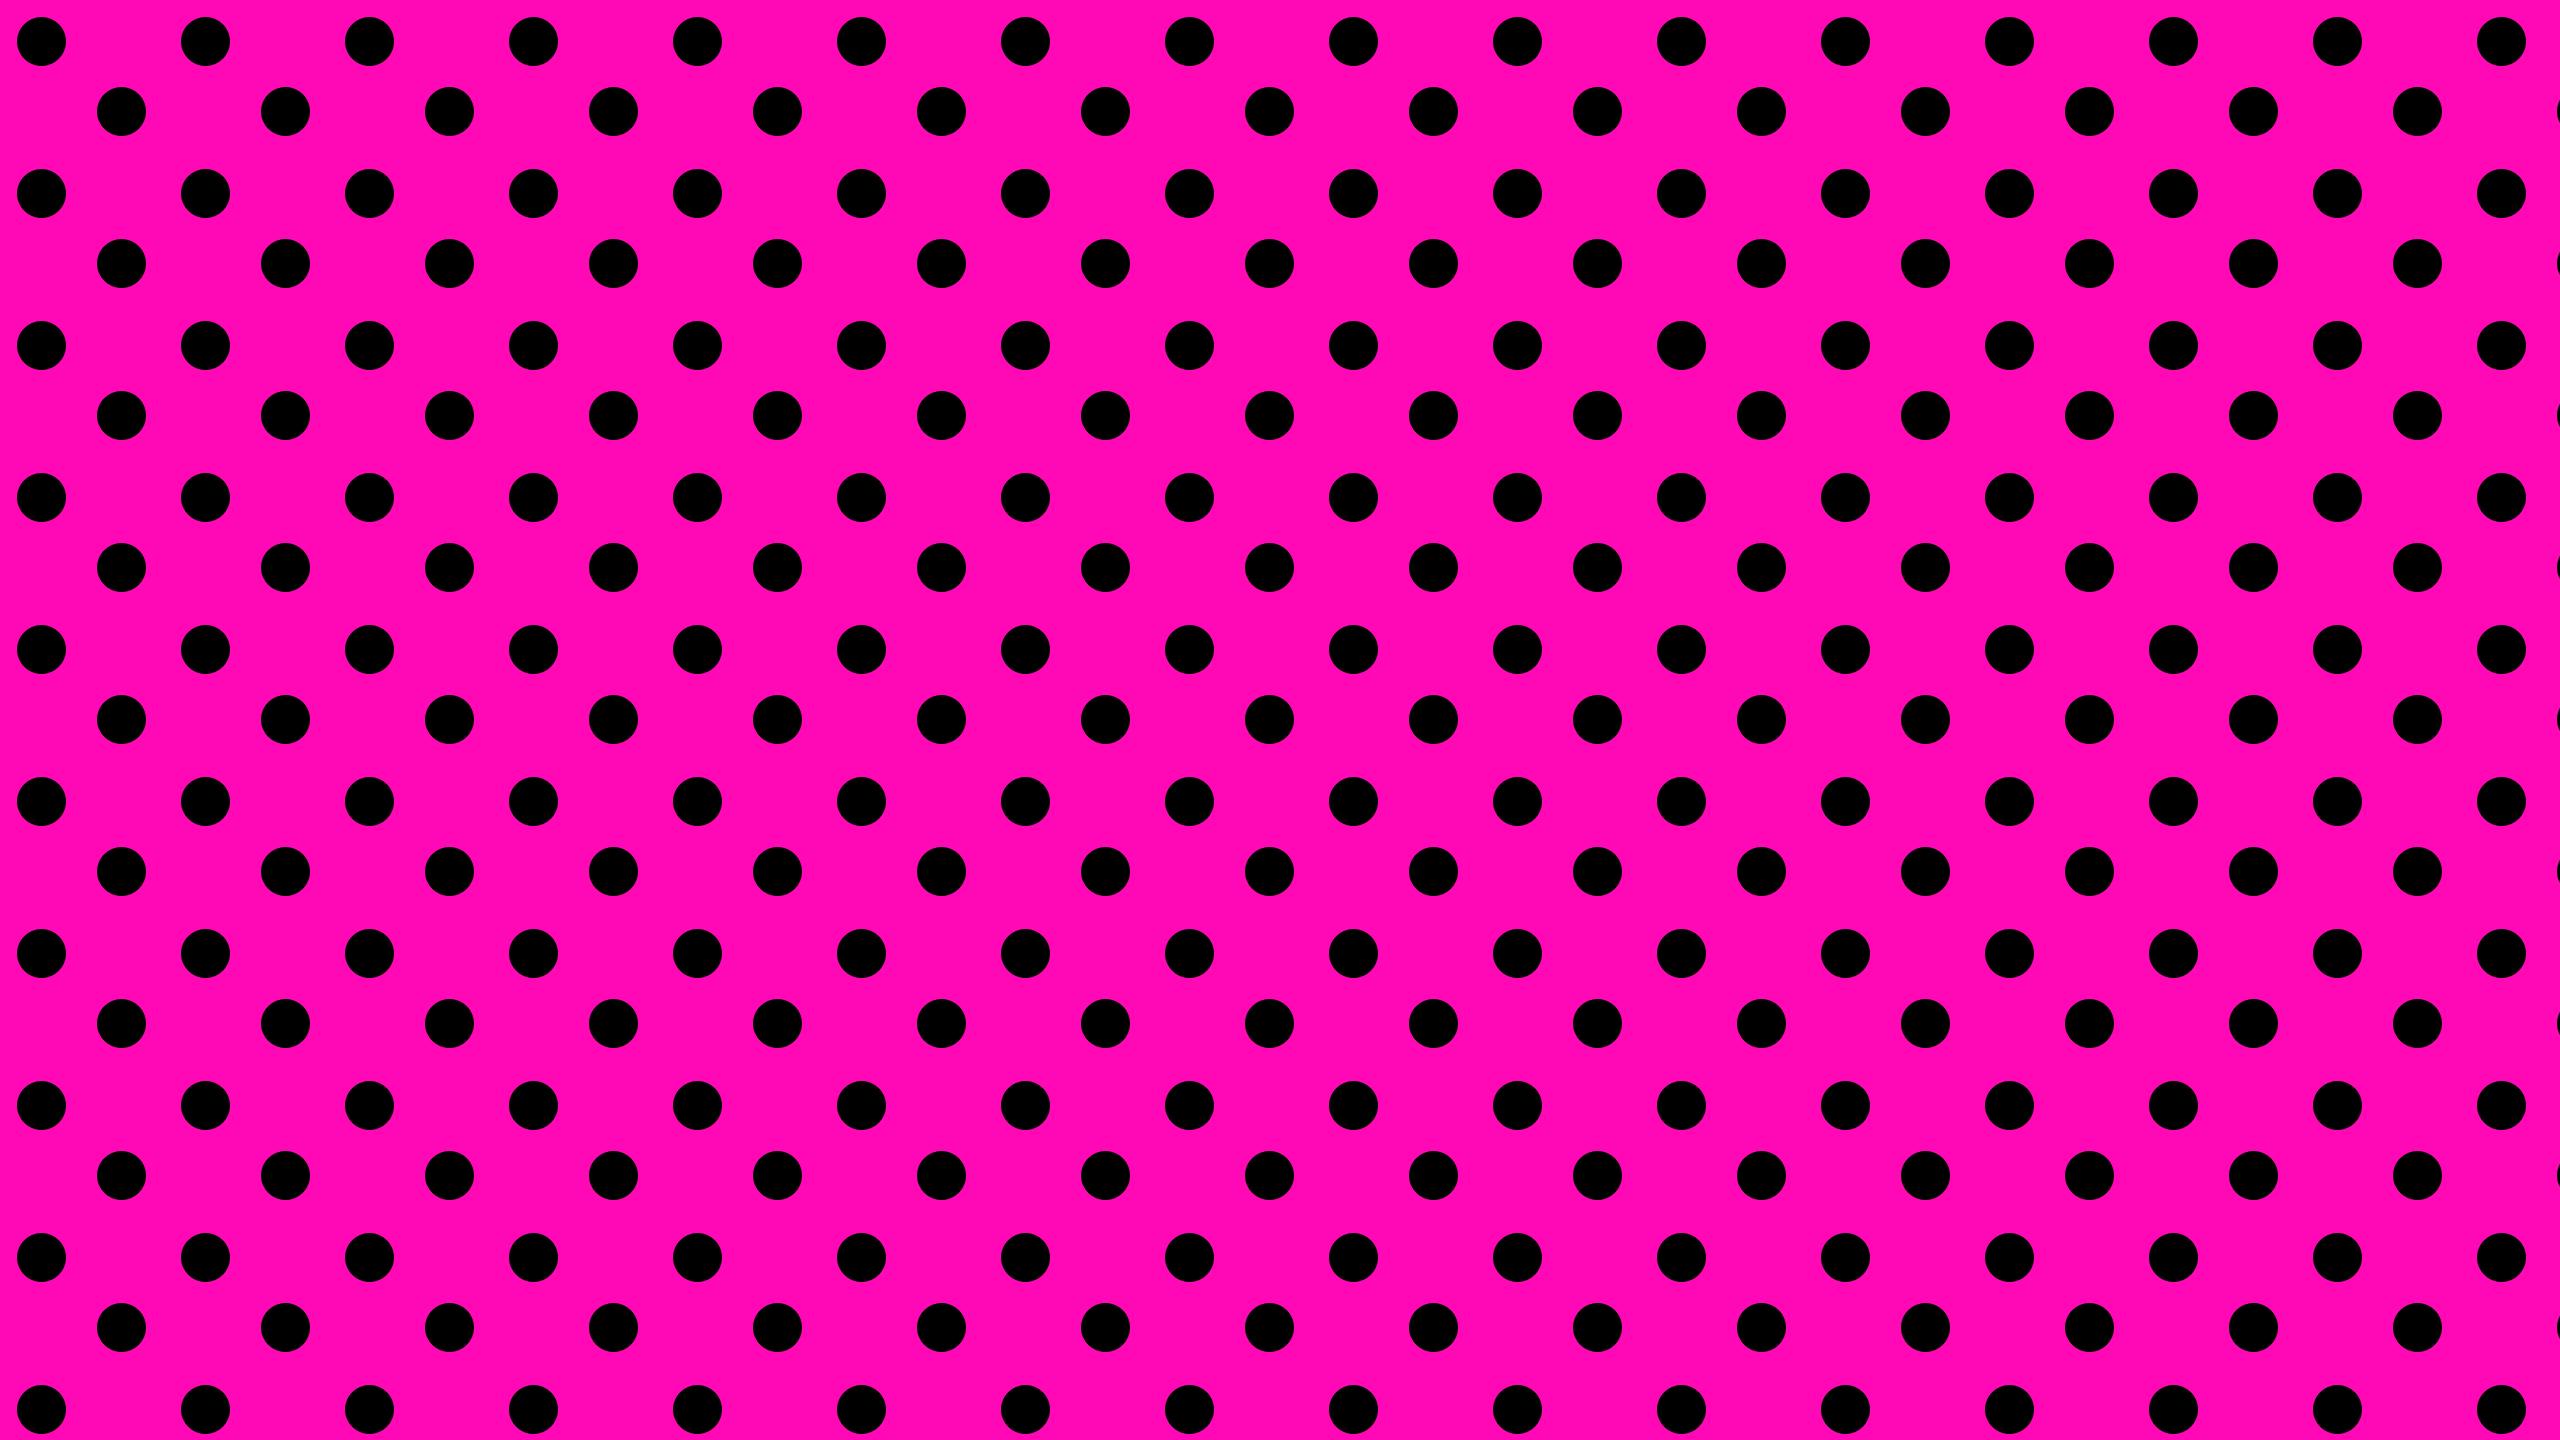 large pink black desktop wallpaper is easy just save the wallpaper